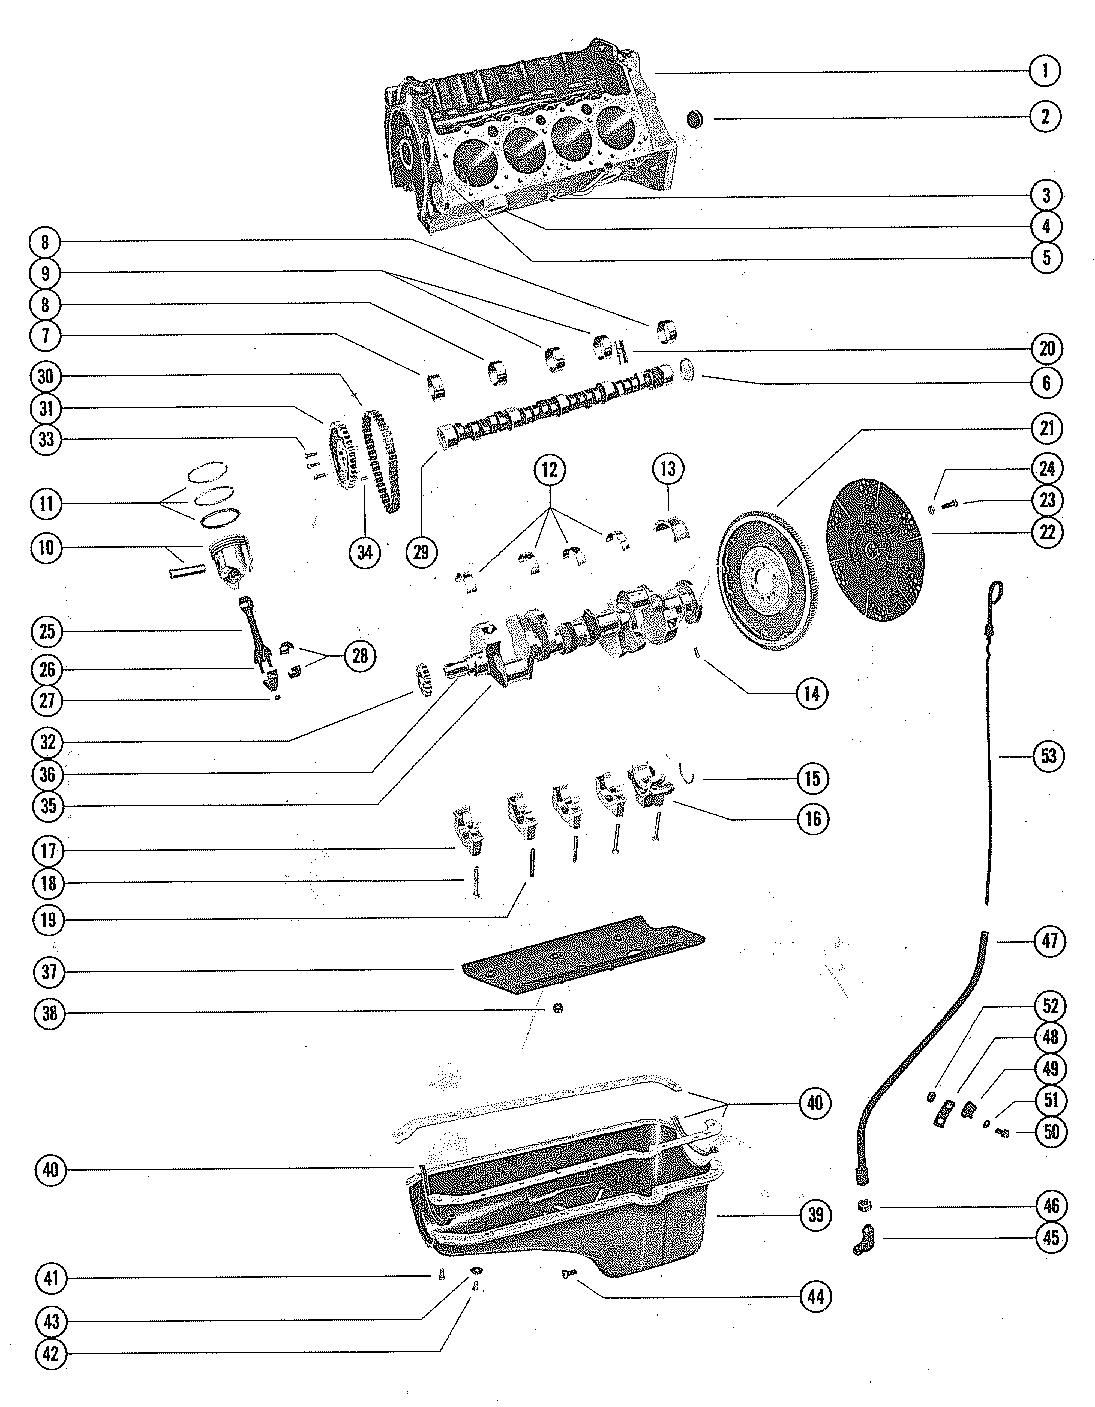 Mercruiser 250 Mie Gm 327 V 8